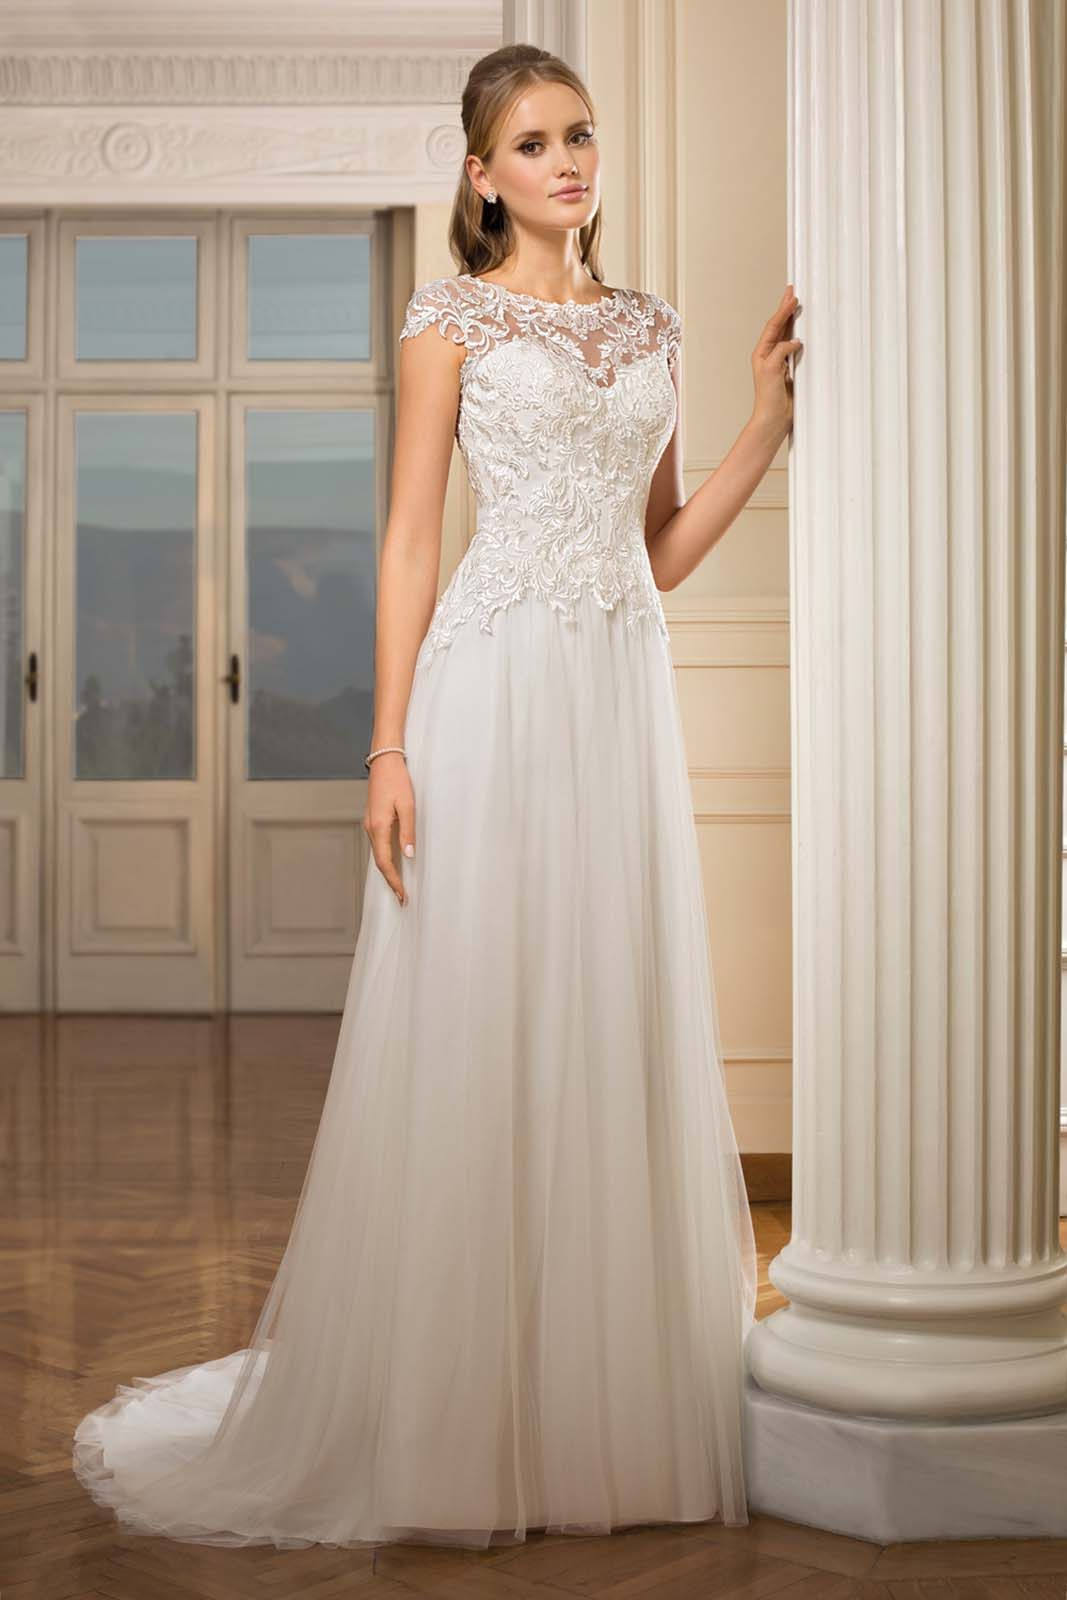 Wedding dress long sleeve  Wedding Dresses  Cosmobella  cut aline neckline illusion